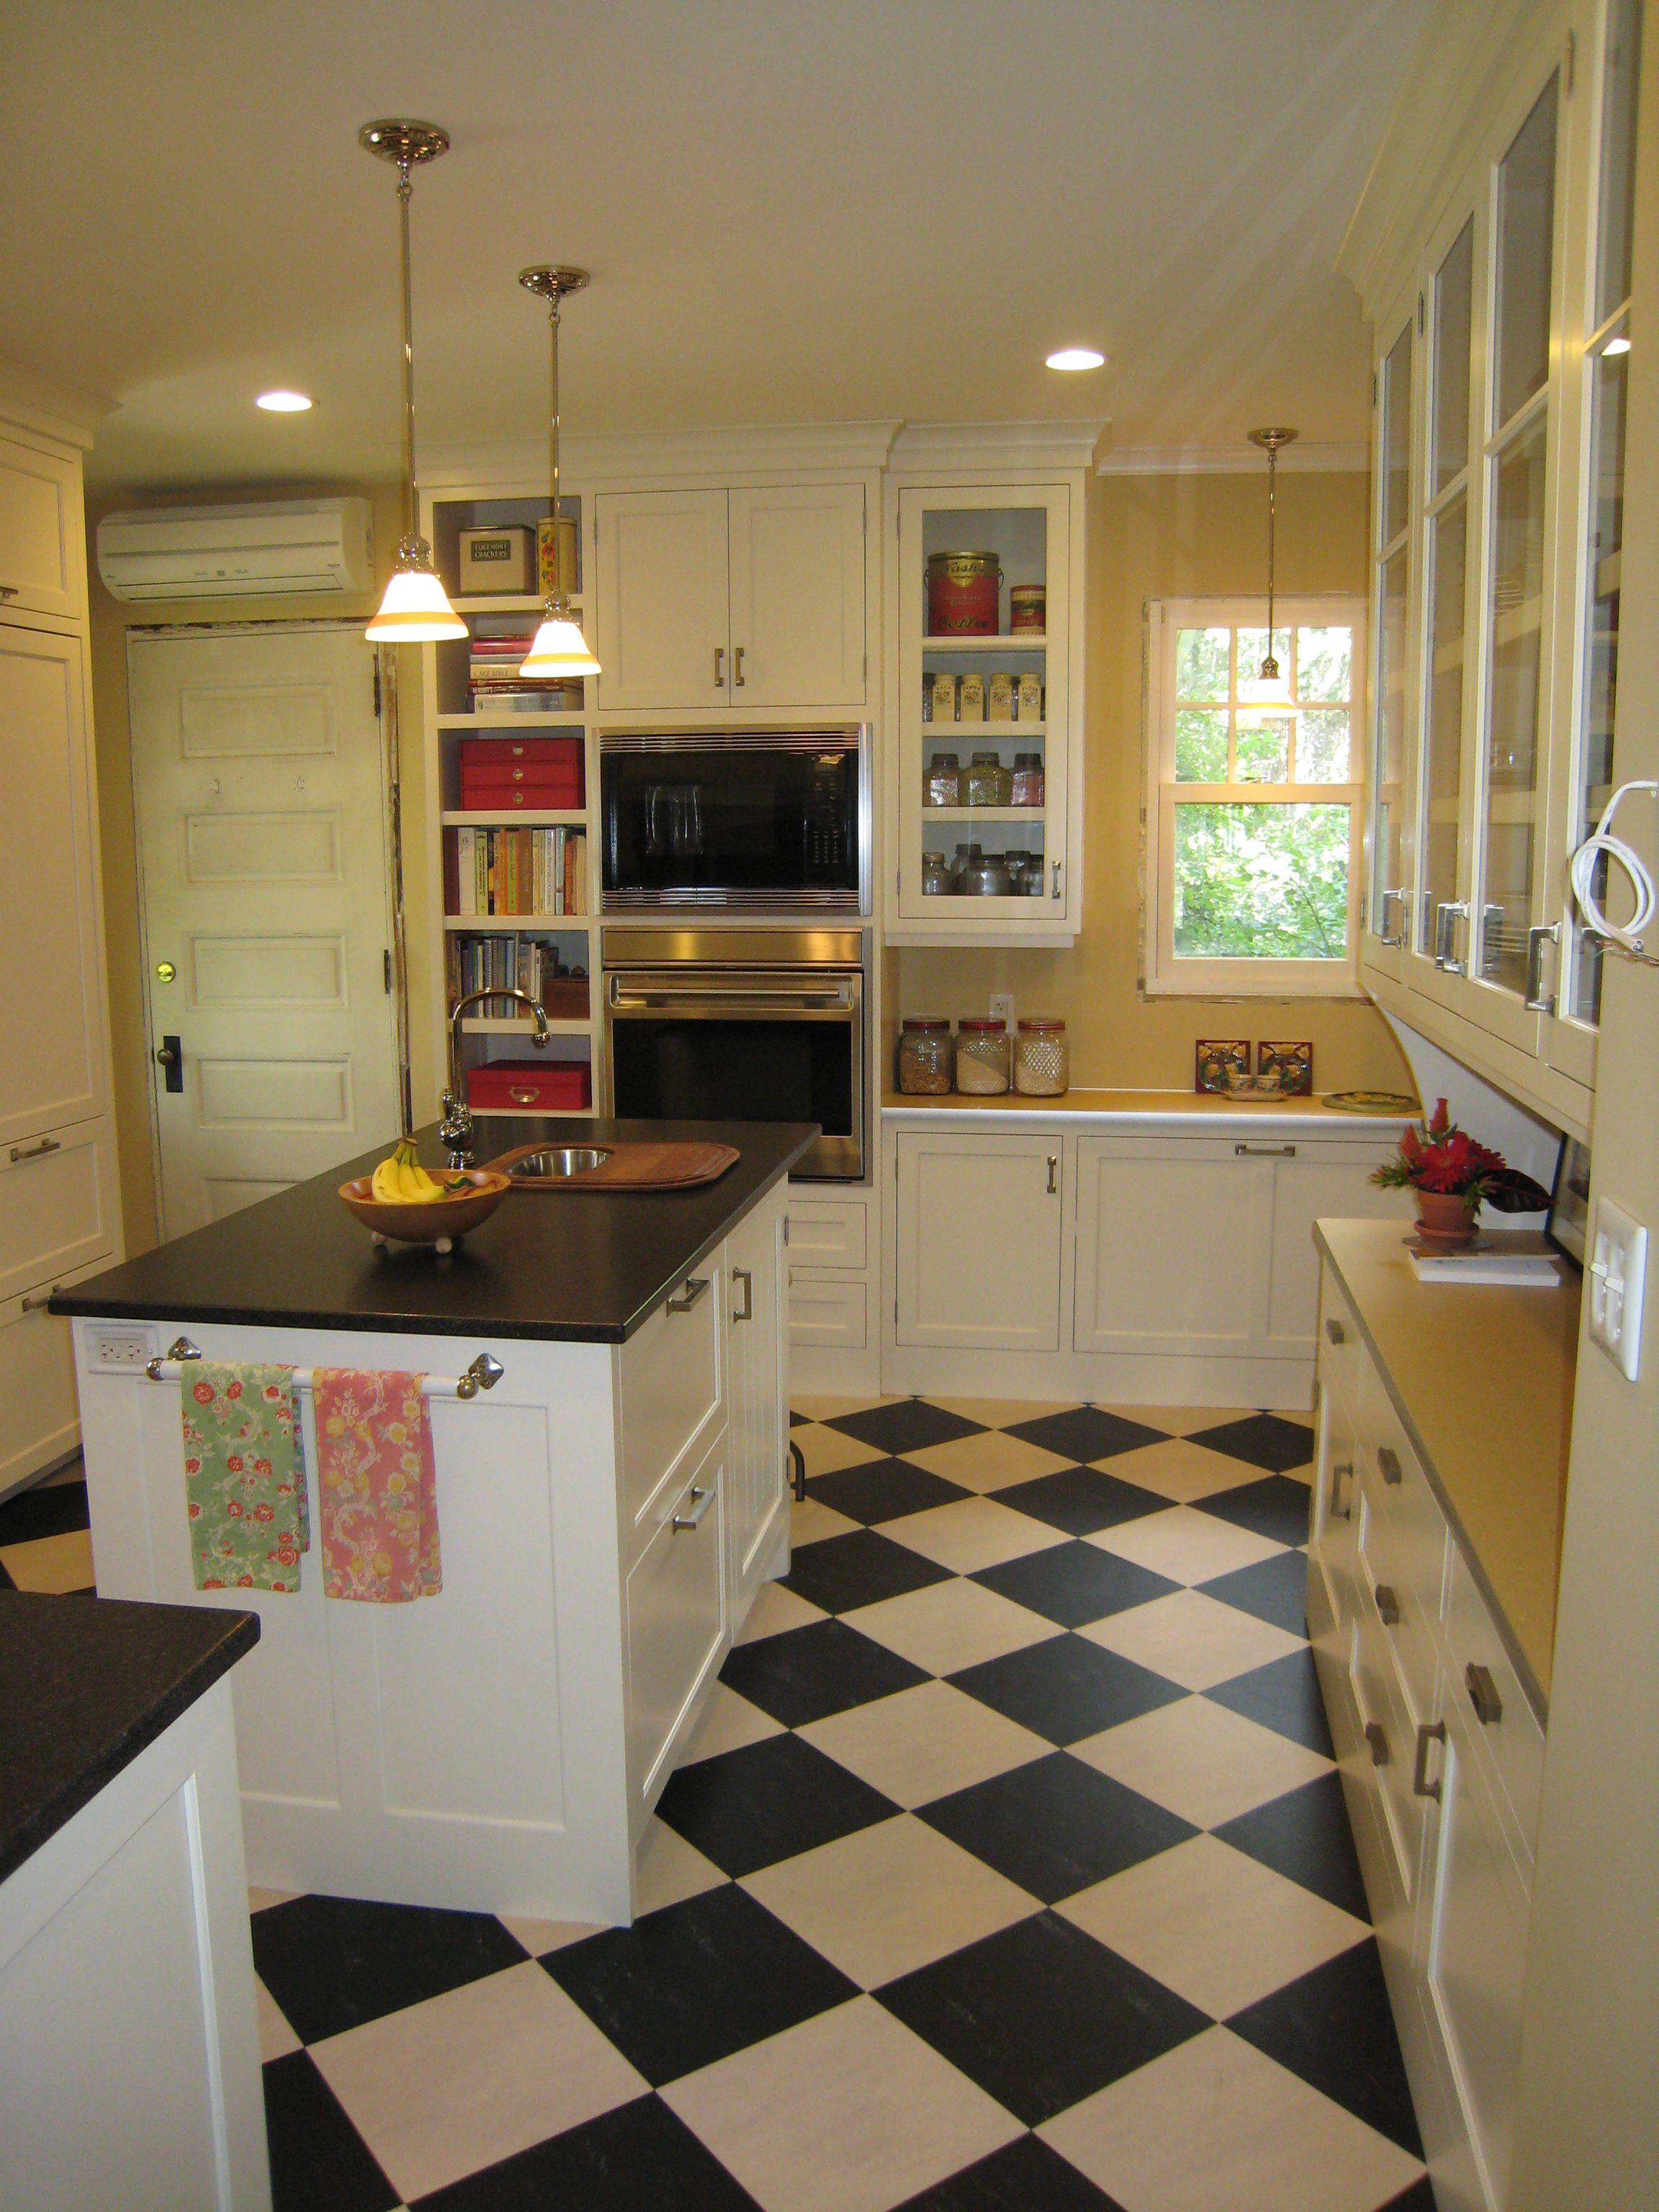 Marmoleum Kitchen With Border Looks Amazing In This Craftsman Style Home Interior Floor Designs Kitchen Flooring Linoleum Kitchen Floors House Design Kitchen